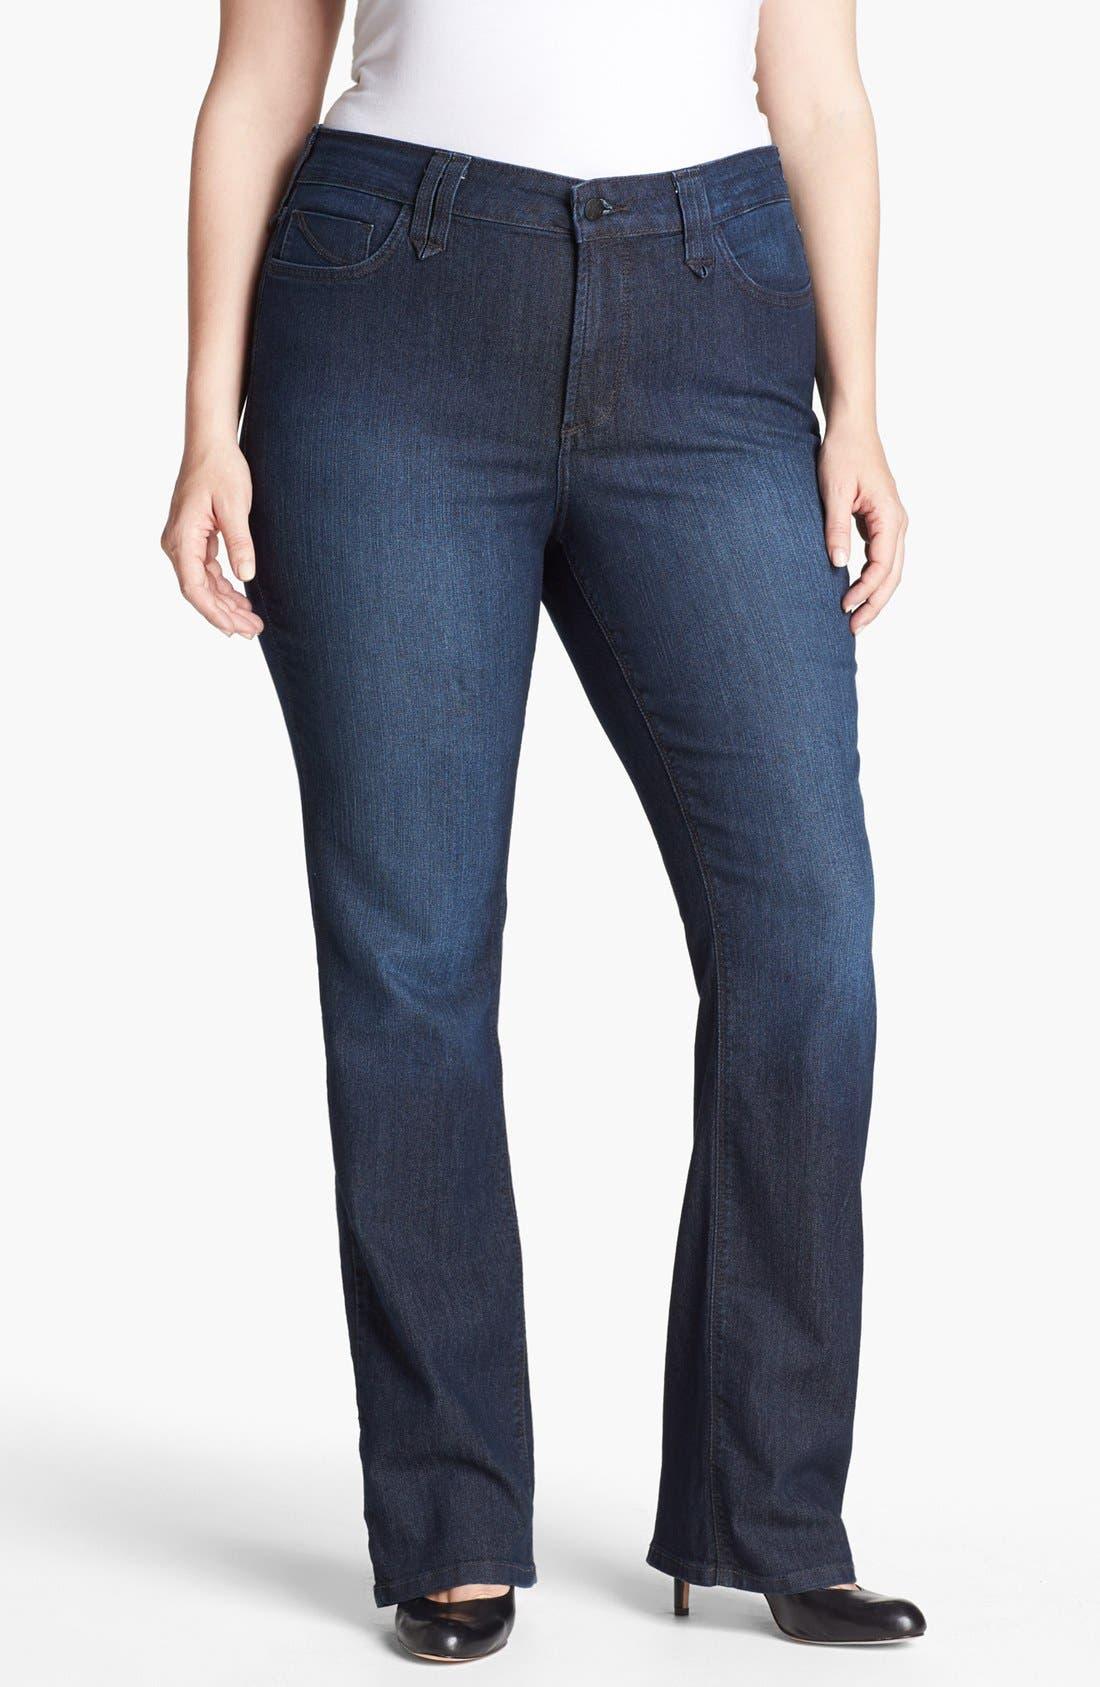 Alternate Image 1 Selected - NYDJ 'Hayden' Stretch Straight Leg Jeans (Burbank) (Plus Size)